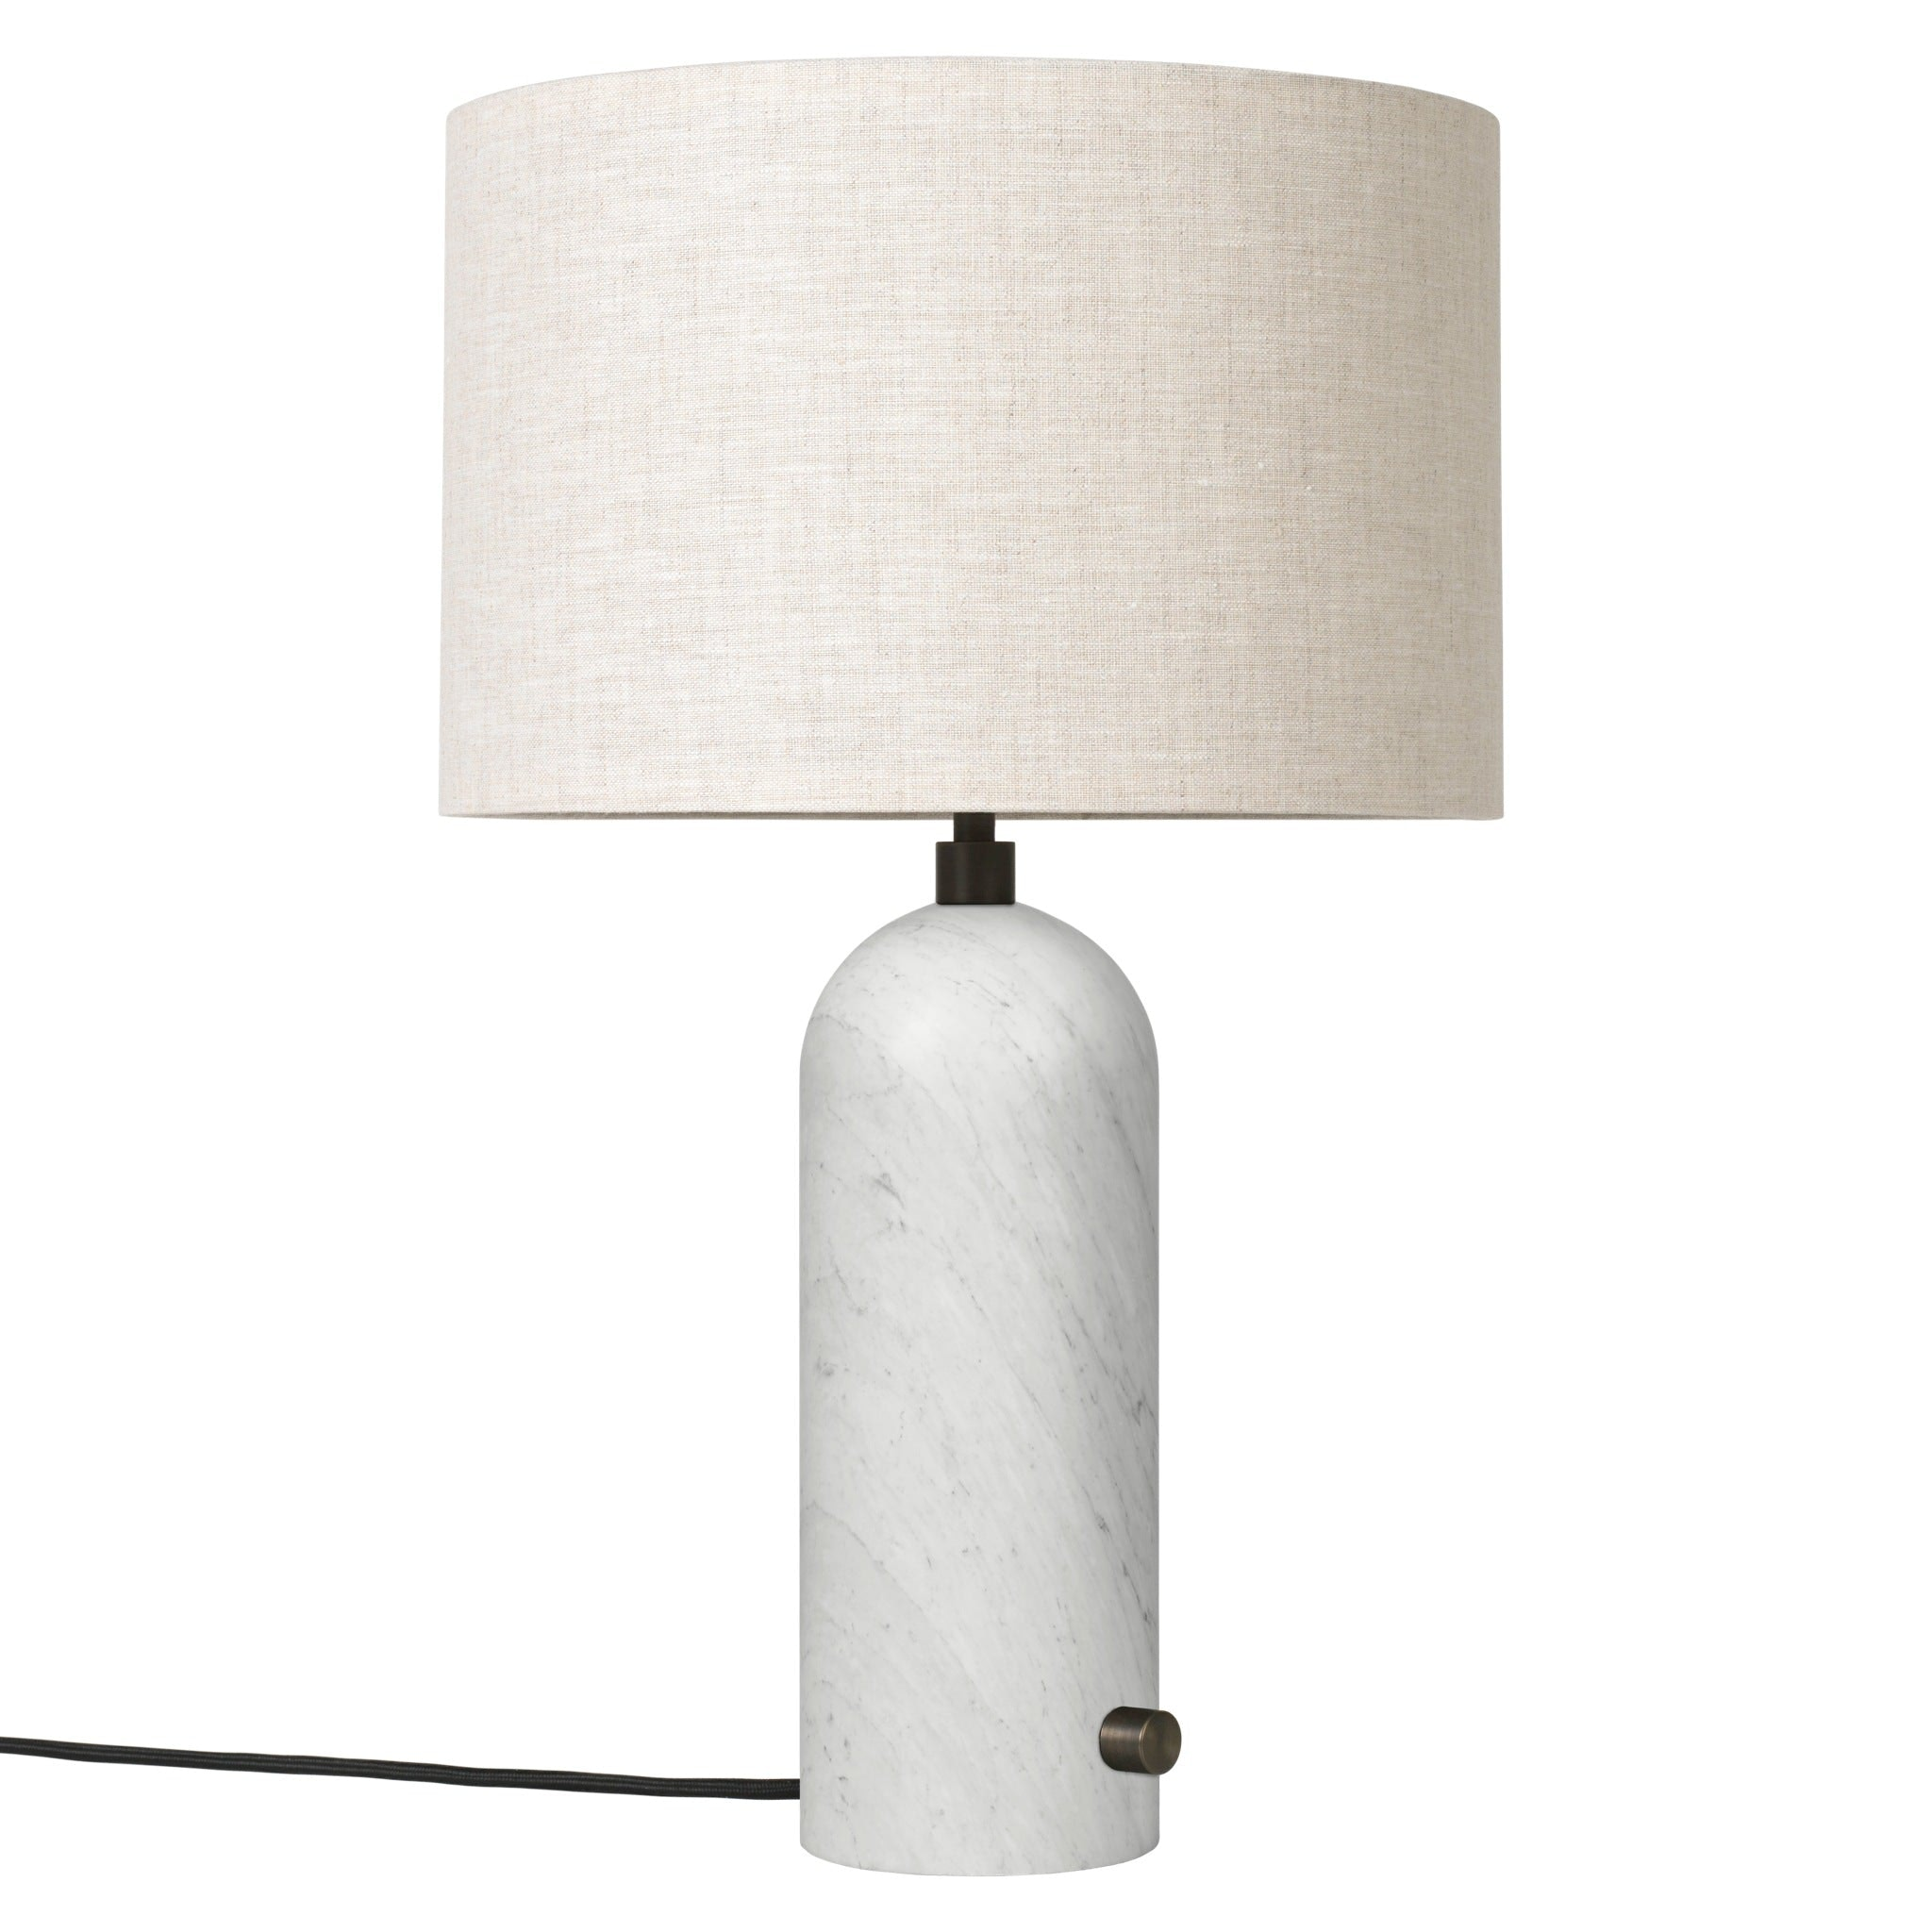 Gravity Table Lamp By Gubi Haus 174